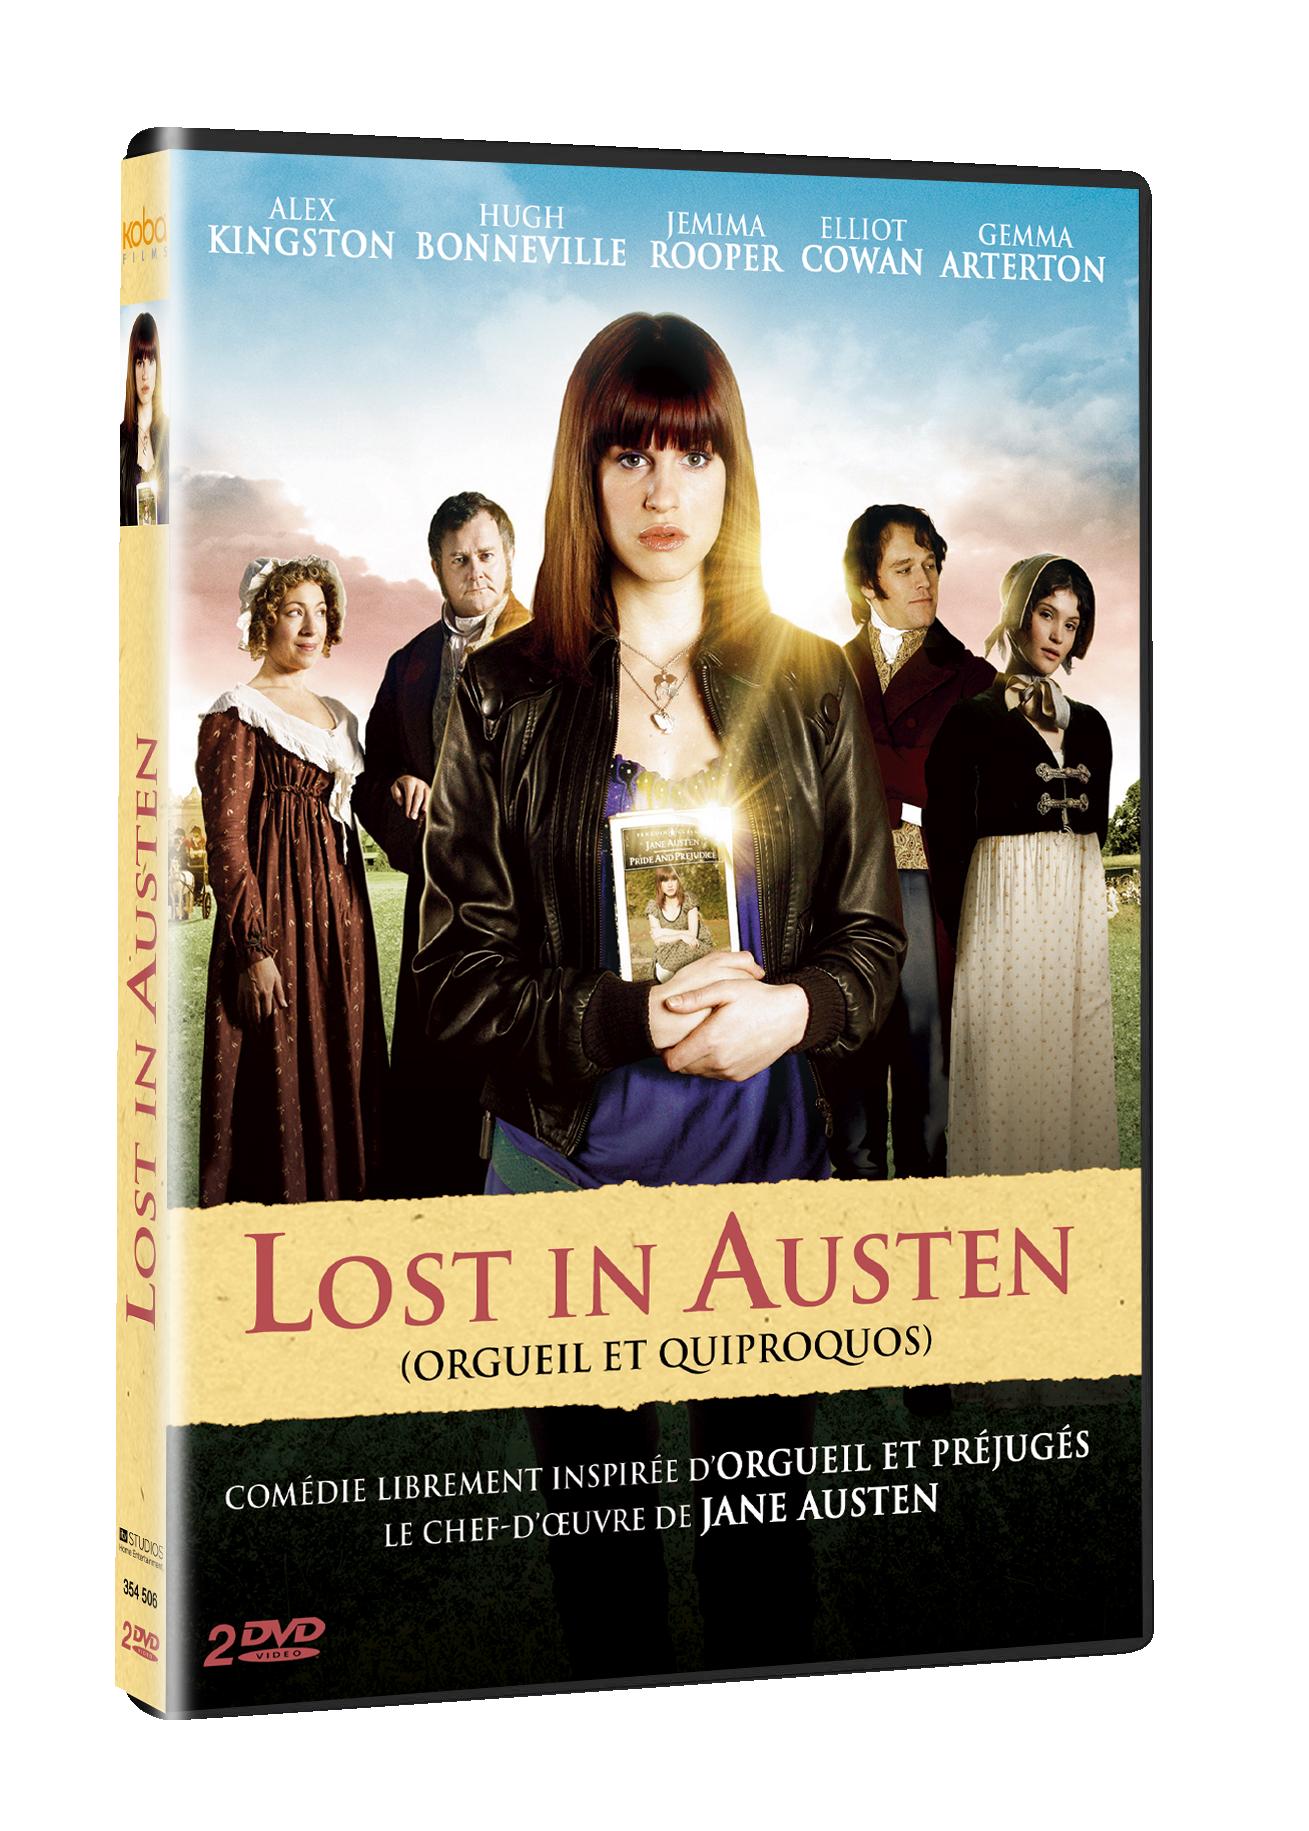 LOST IN AUSTEN (2 DVD)